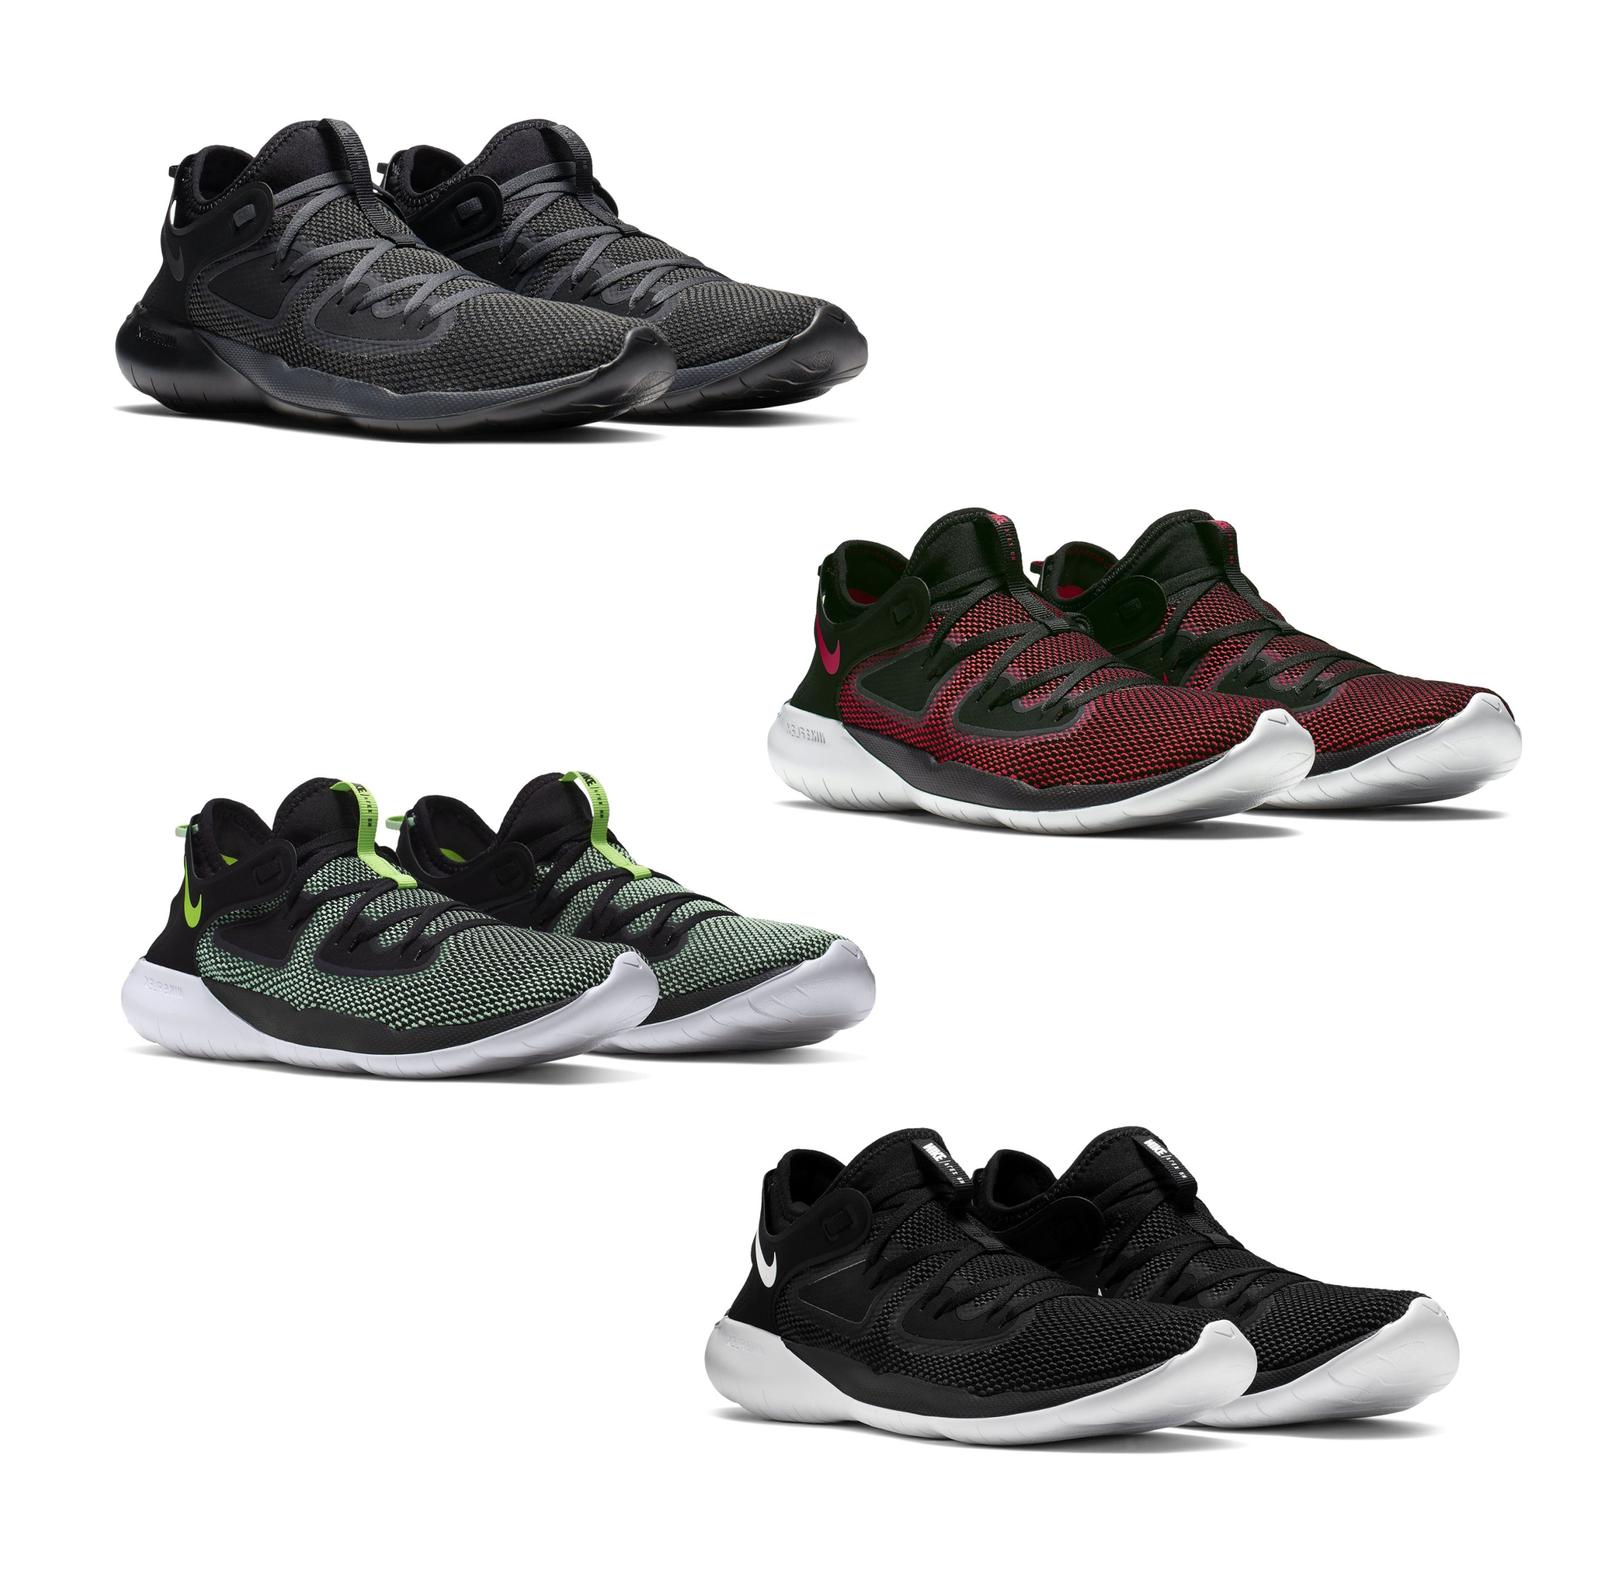 Nike Flex 2019 Run Herren Laufschuhe Turnschuhe Joggingschuhe Sneaker Jogging 13